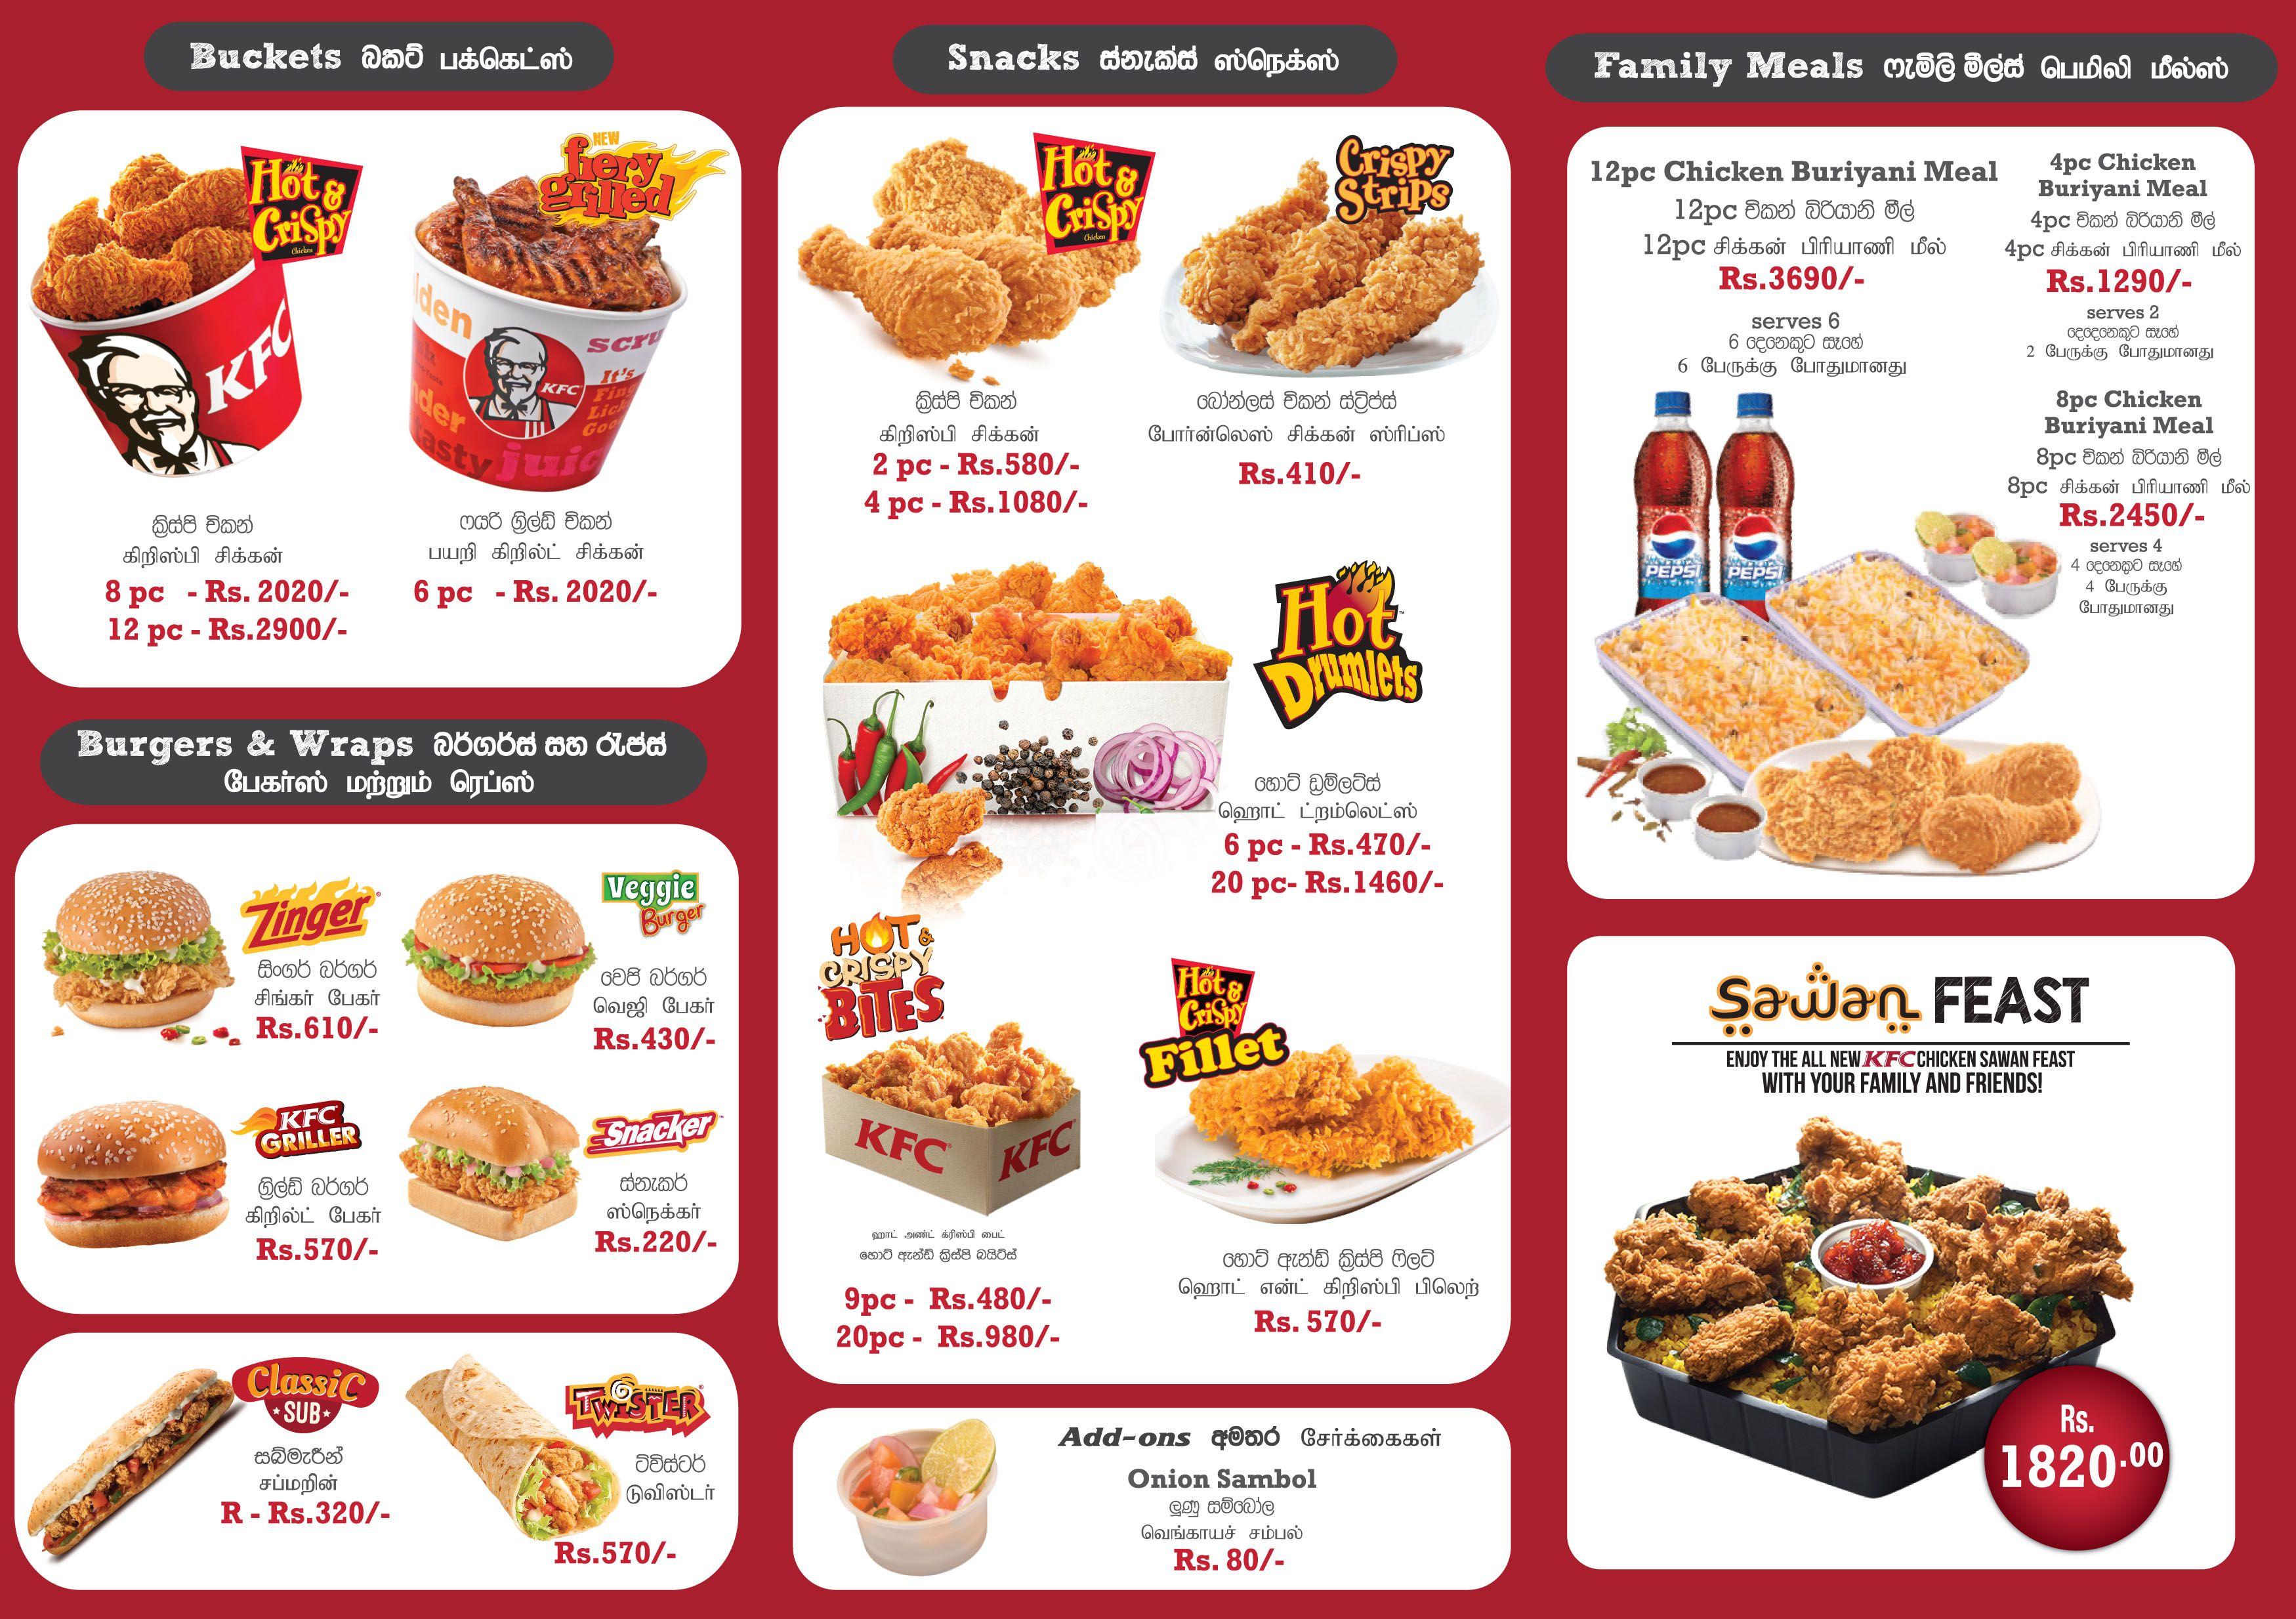 Kfc Menu Buckets Prices In 2020 Kfc Kentucky Fried Chicken Menu Chicken Menu